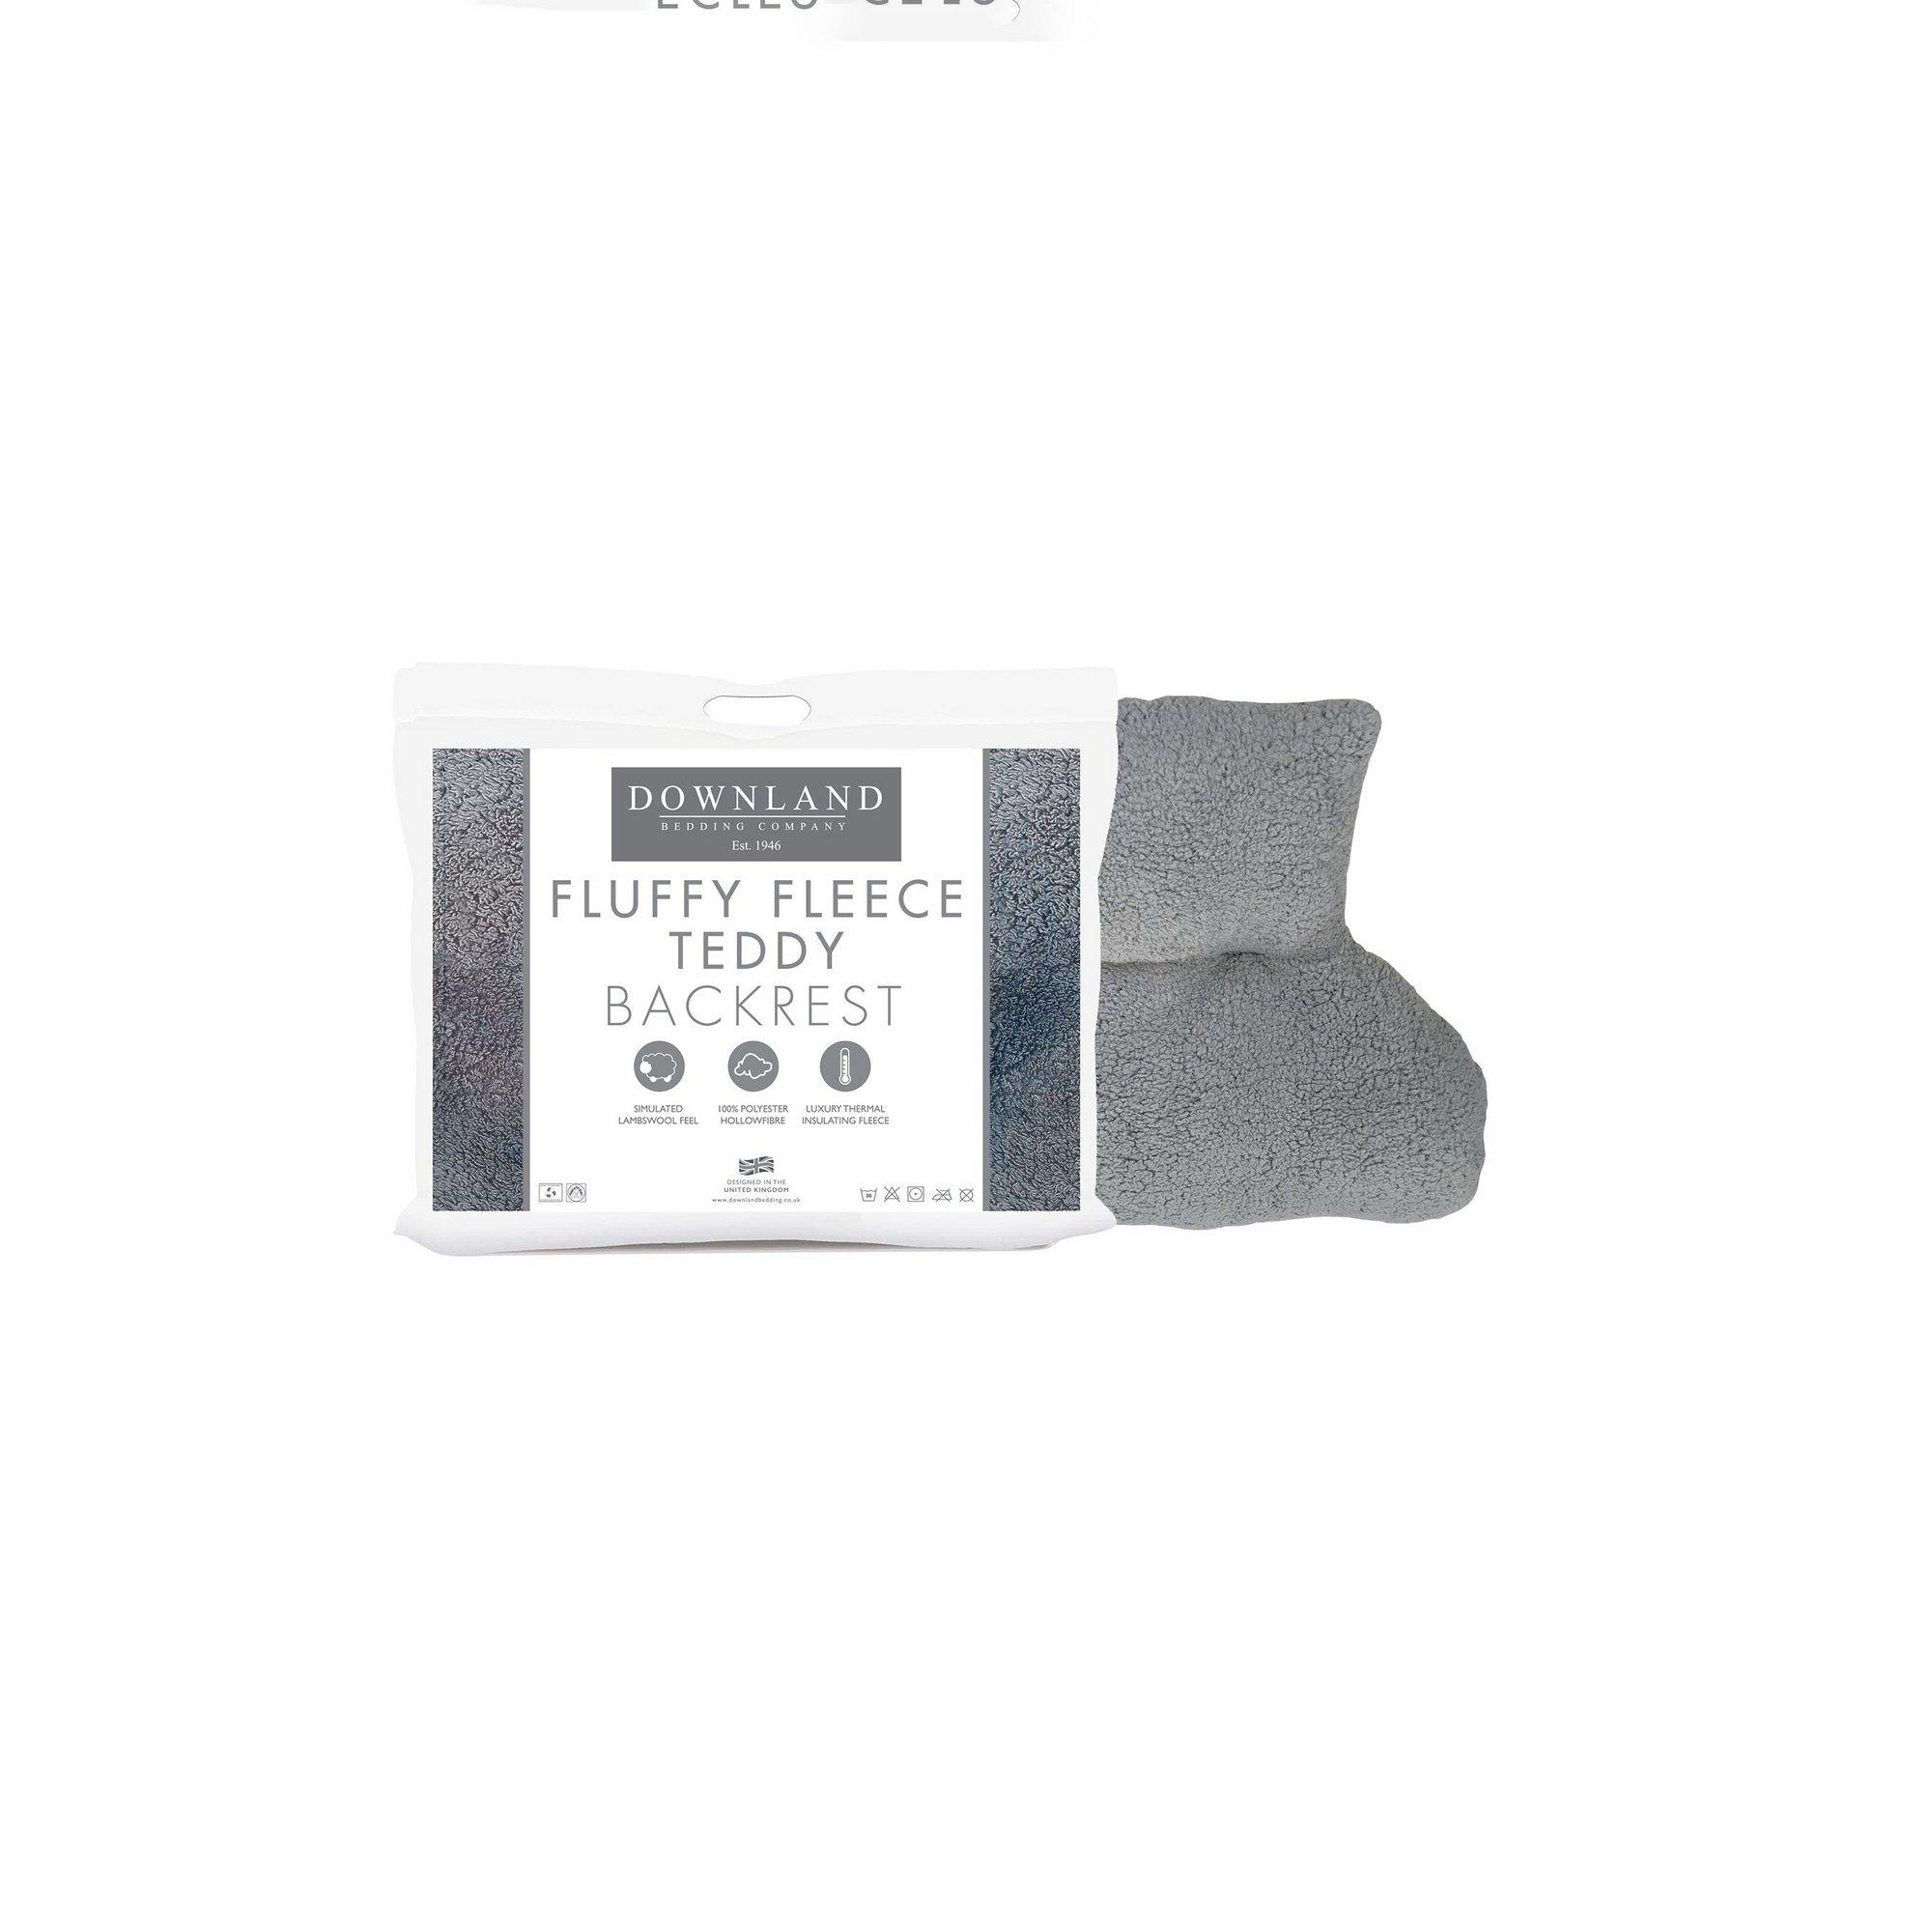 Image of Downland Fluffy Fleece Teddy Backrest Pillow